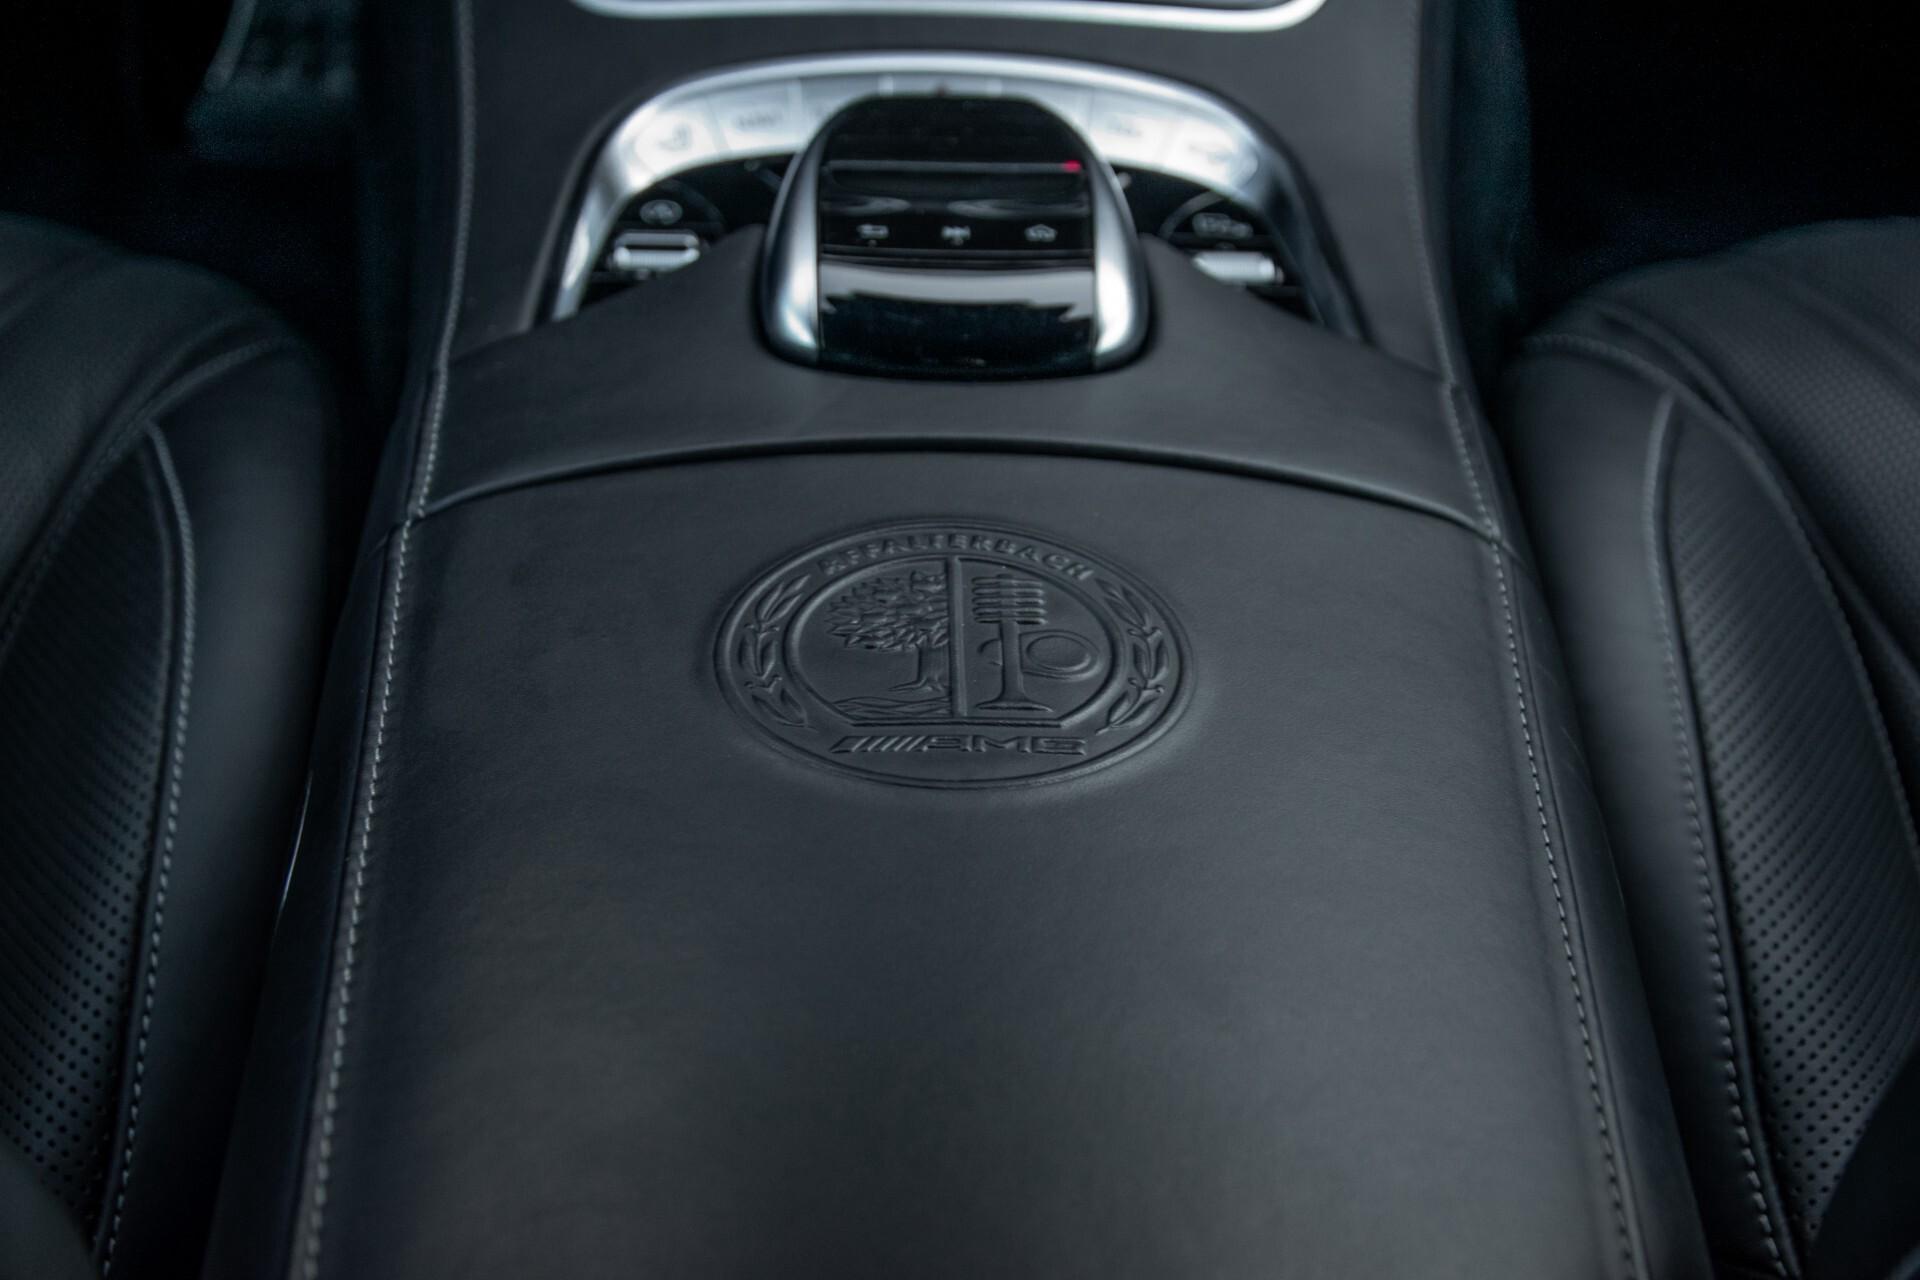 Mercedes-Benz S-Klasse Cabrio 63 AMG 4M+ Keramisch/Burmester High End 3D/Carbon/Driverspack/Blackpack Aut9 Foto 57